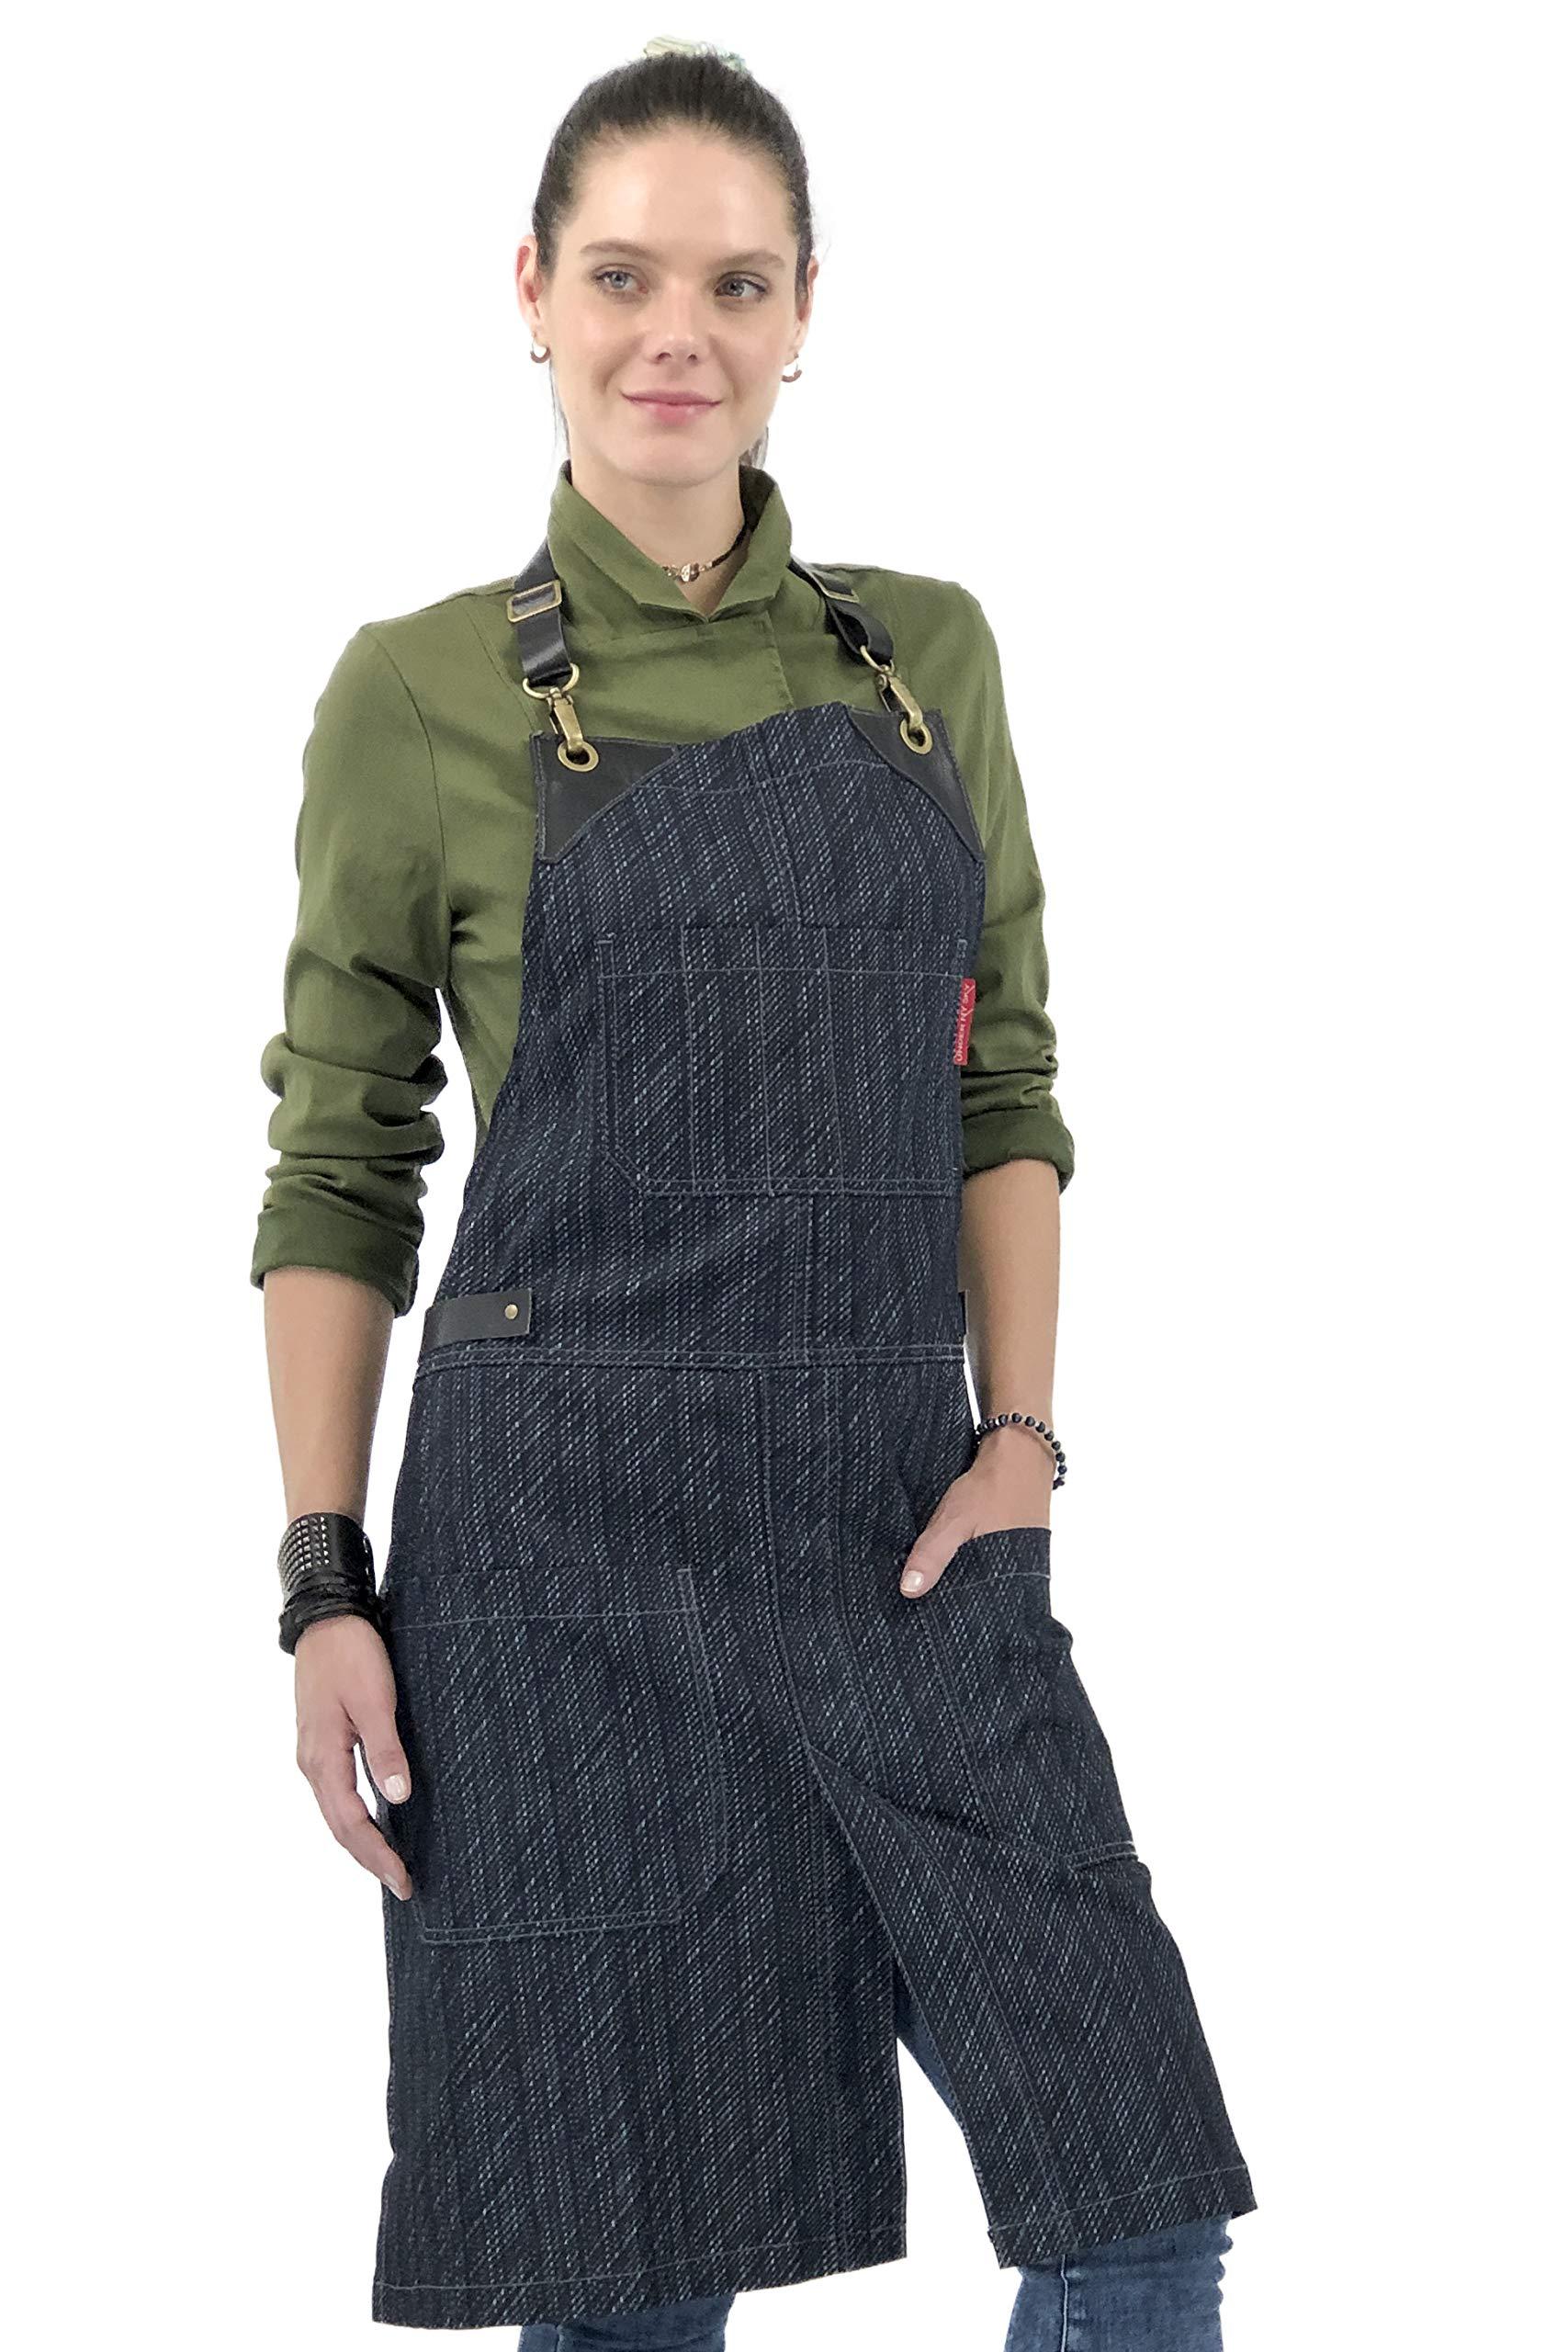 Under NY Sky Dark Blue Stripe Denim Apron - Full Grain Leather Straps - No-Tie, Split-Leg, Adjustable for Men, Women - Pro Chef, Kitchen, Tattoo Artist, Barista, Bartender, Server, Barber, SaloN by Under NY Sky